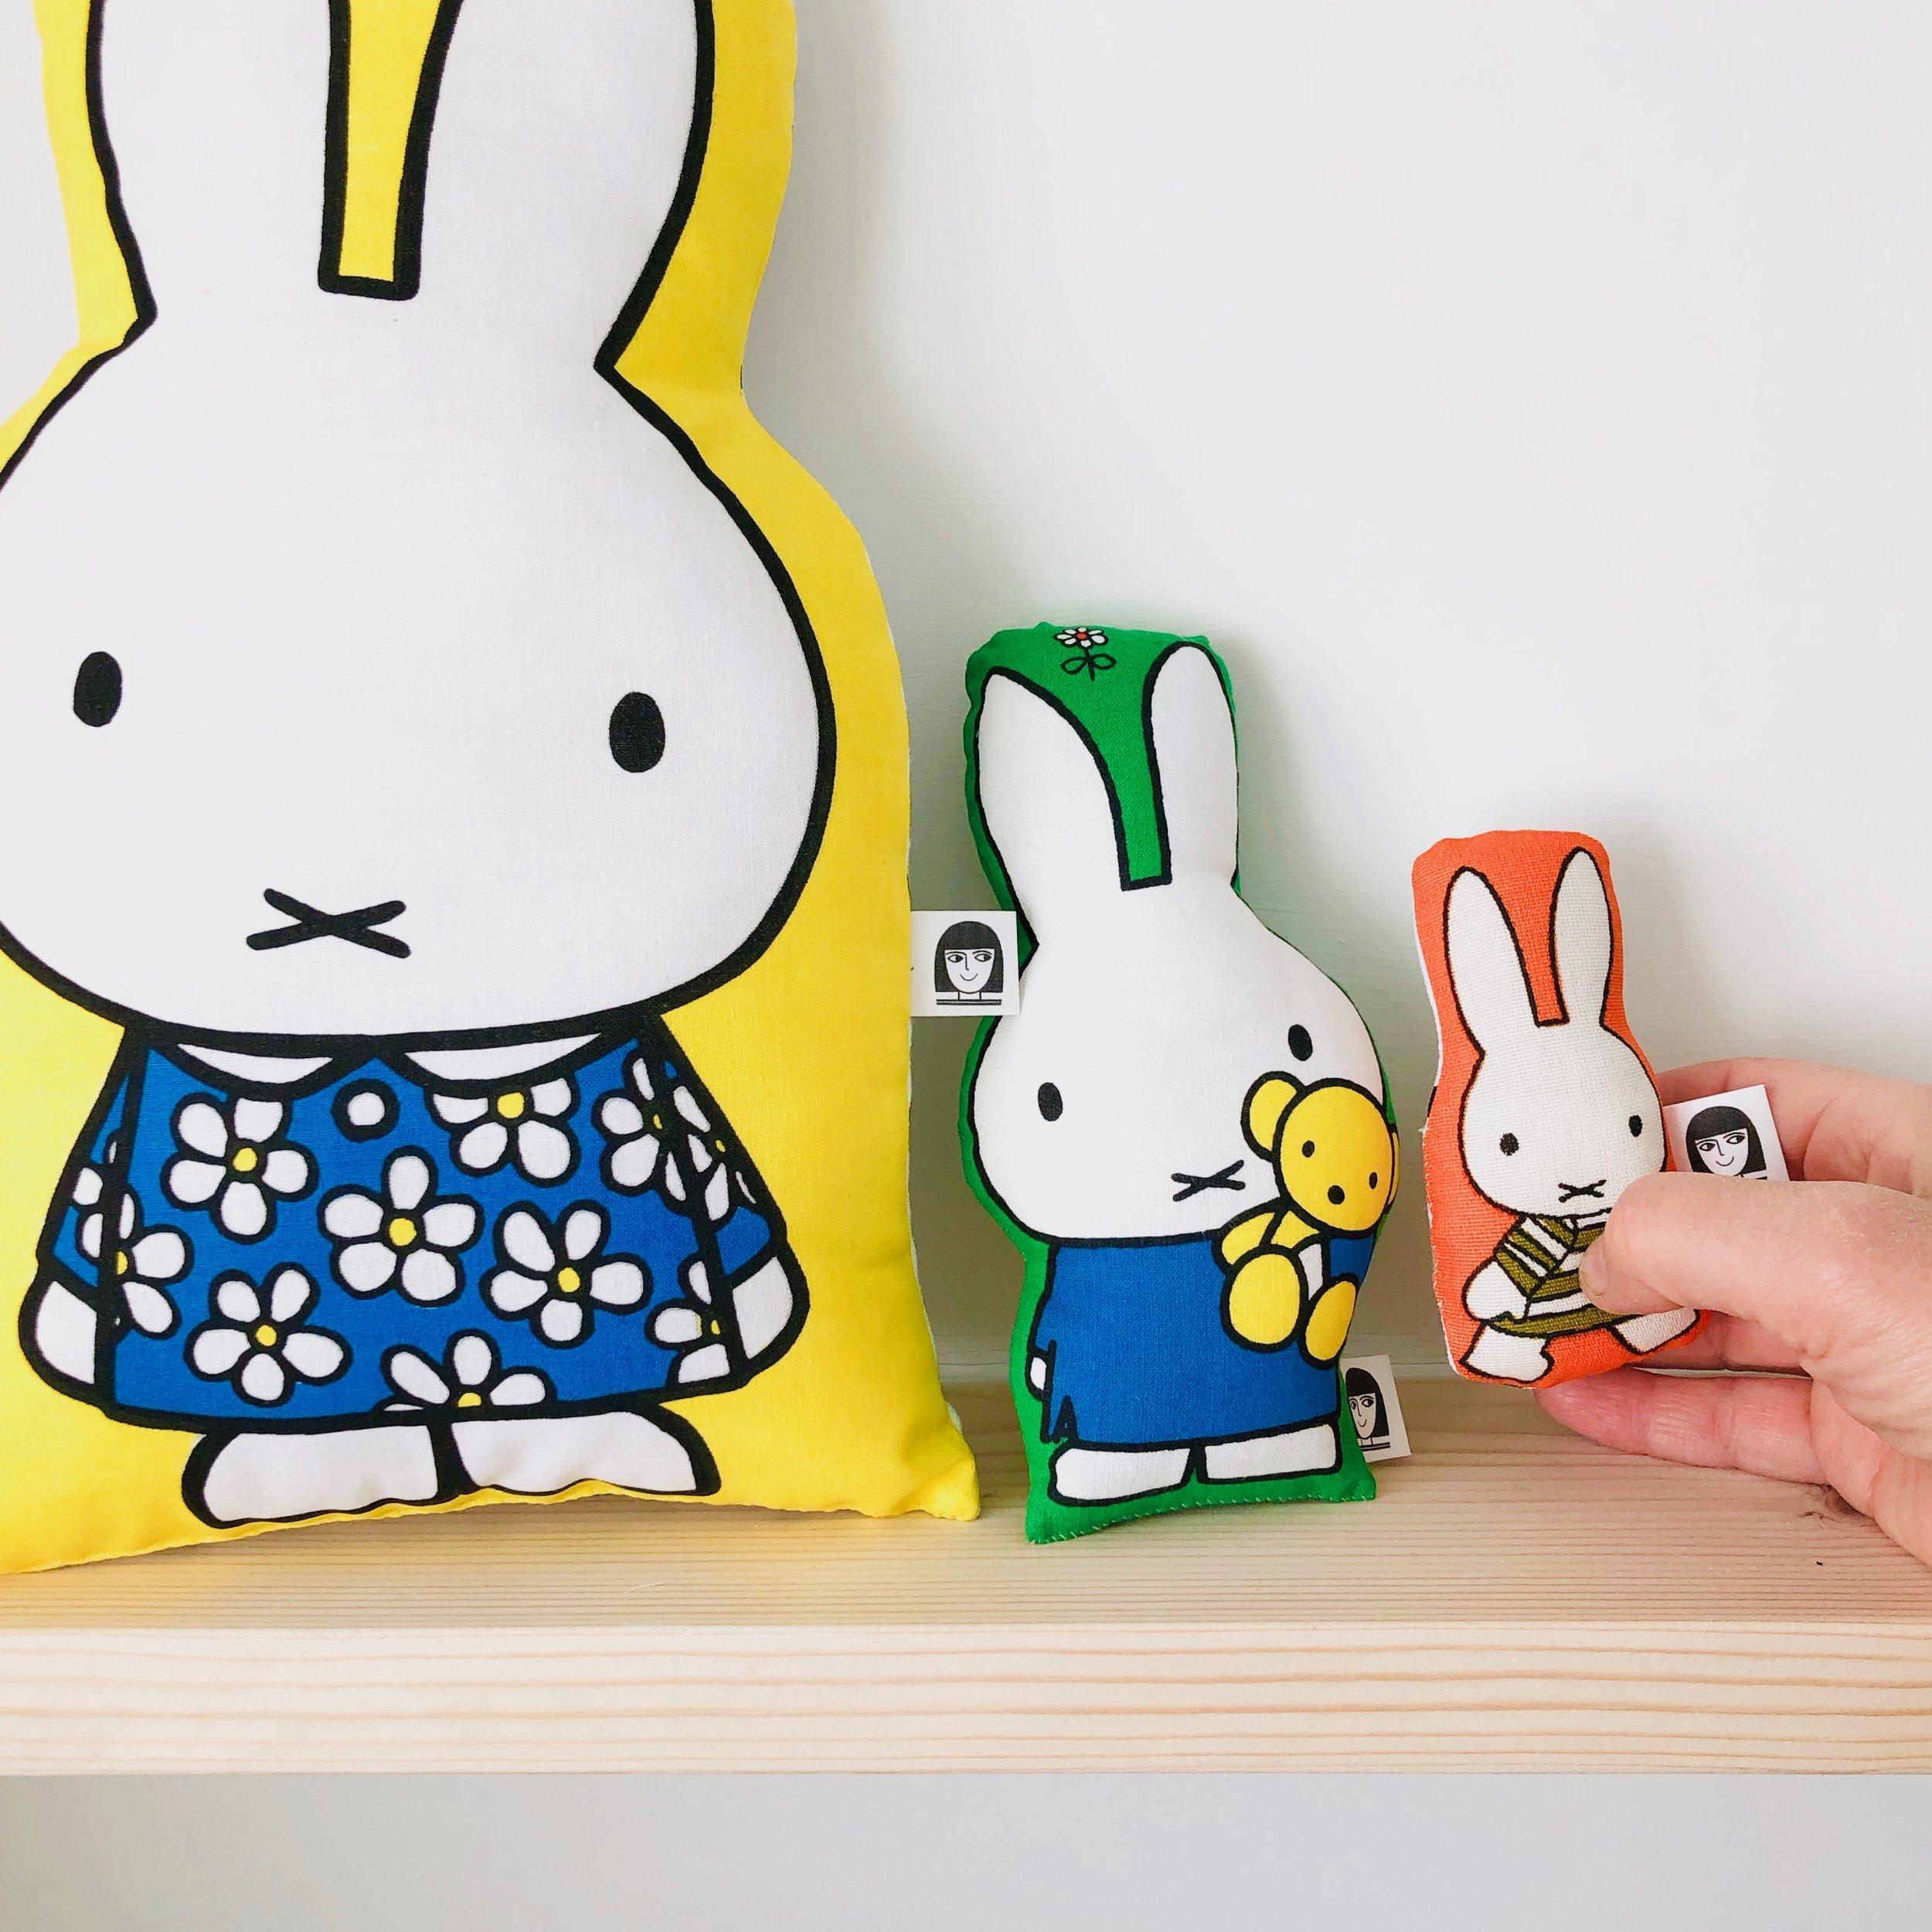 My handmade Miffy toys - Jane Foster